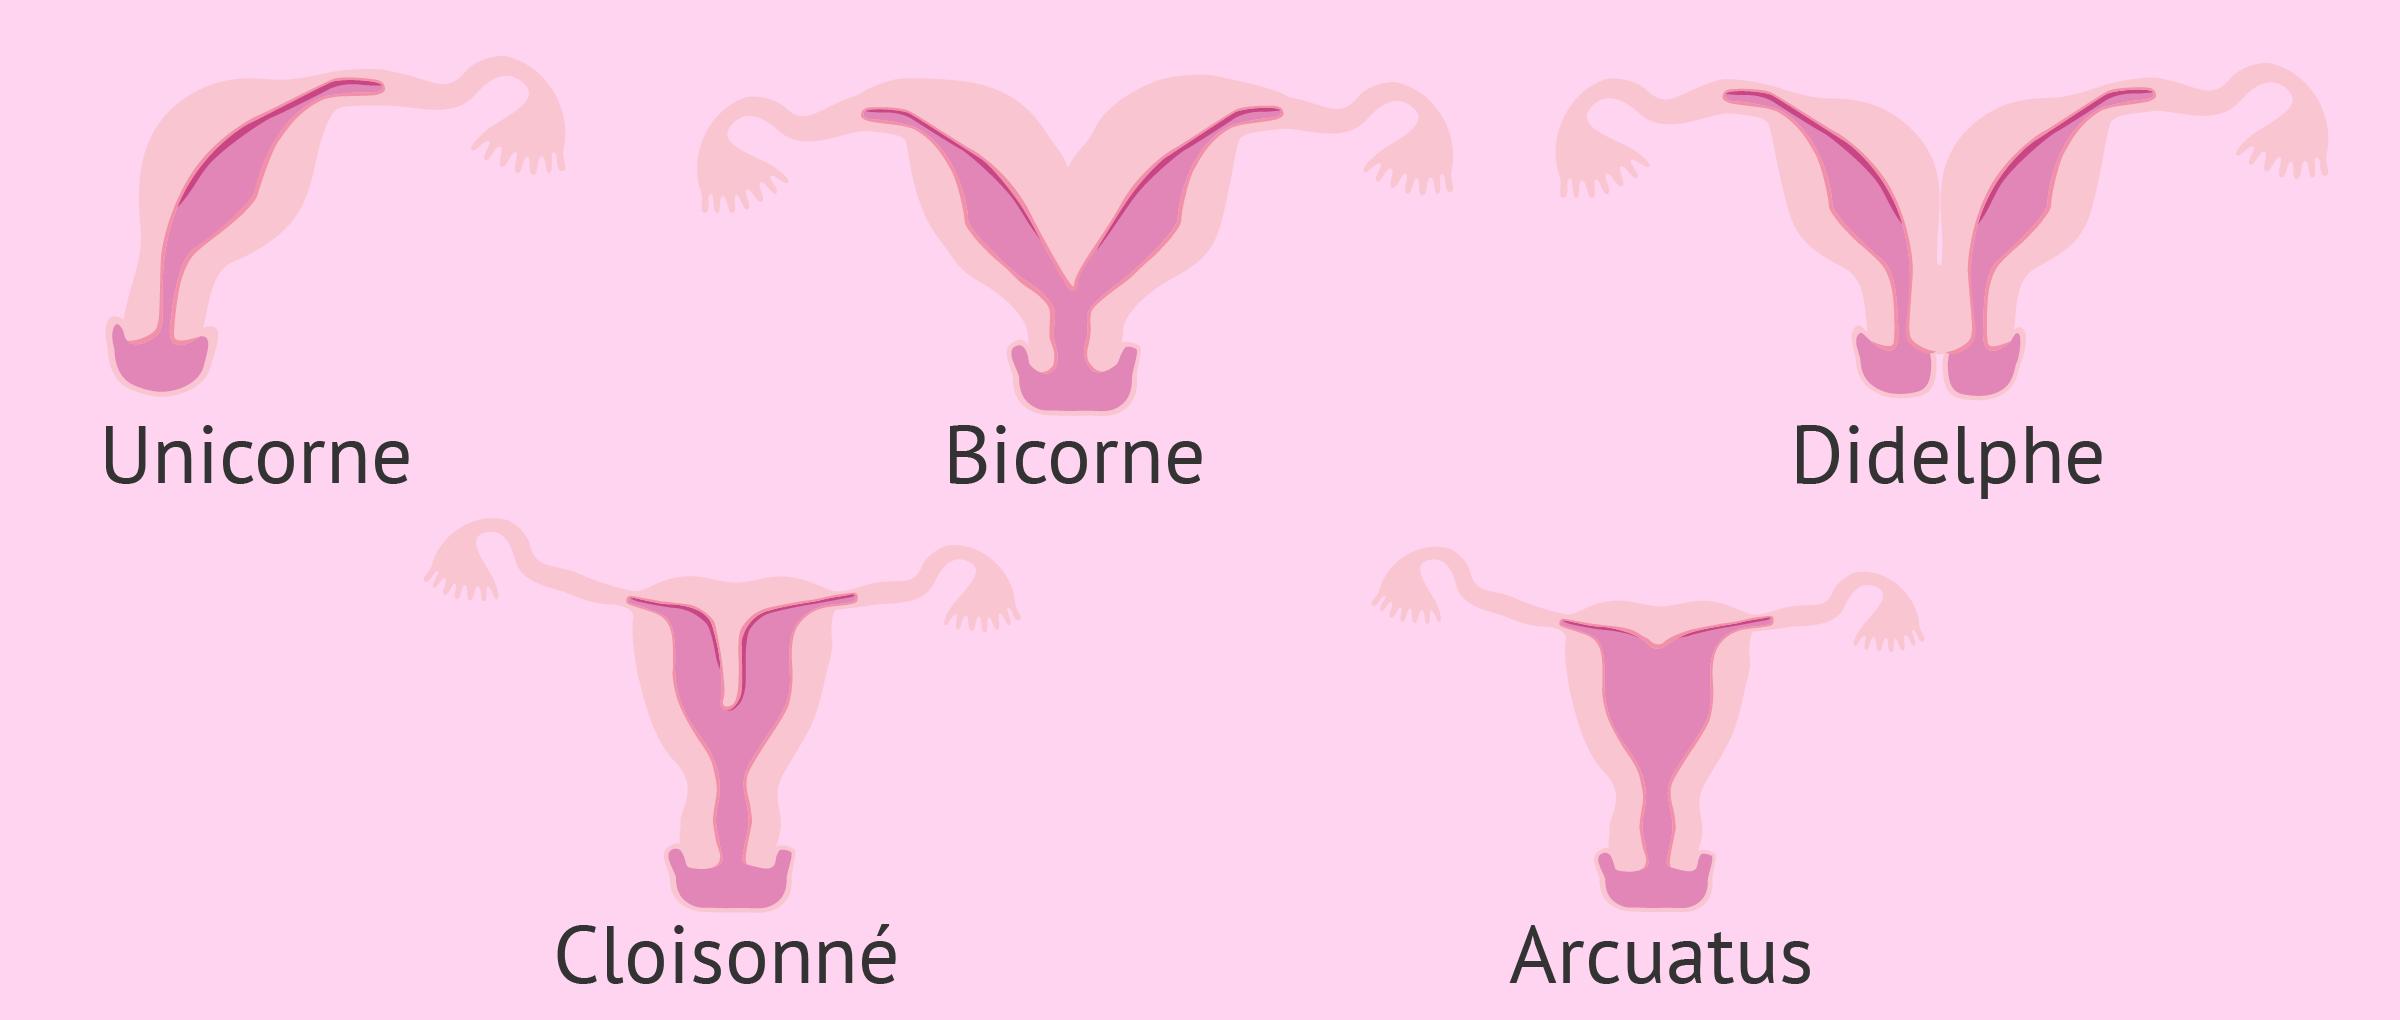 Malformations utérines: causes, diagnostic et grossesse